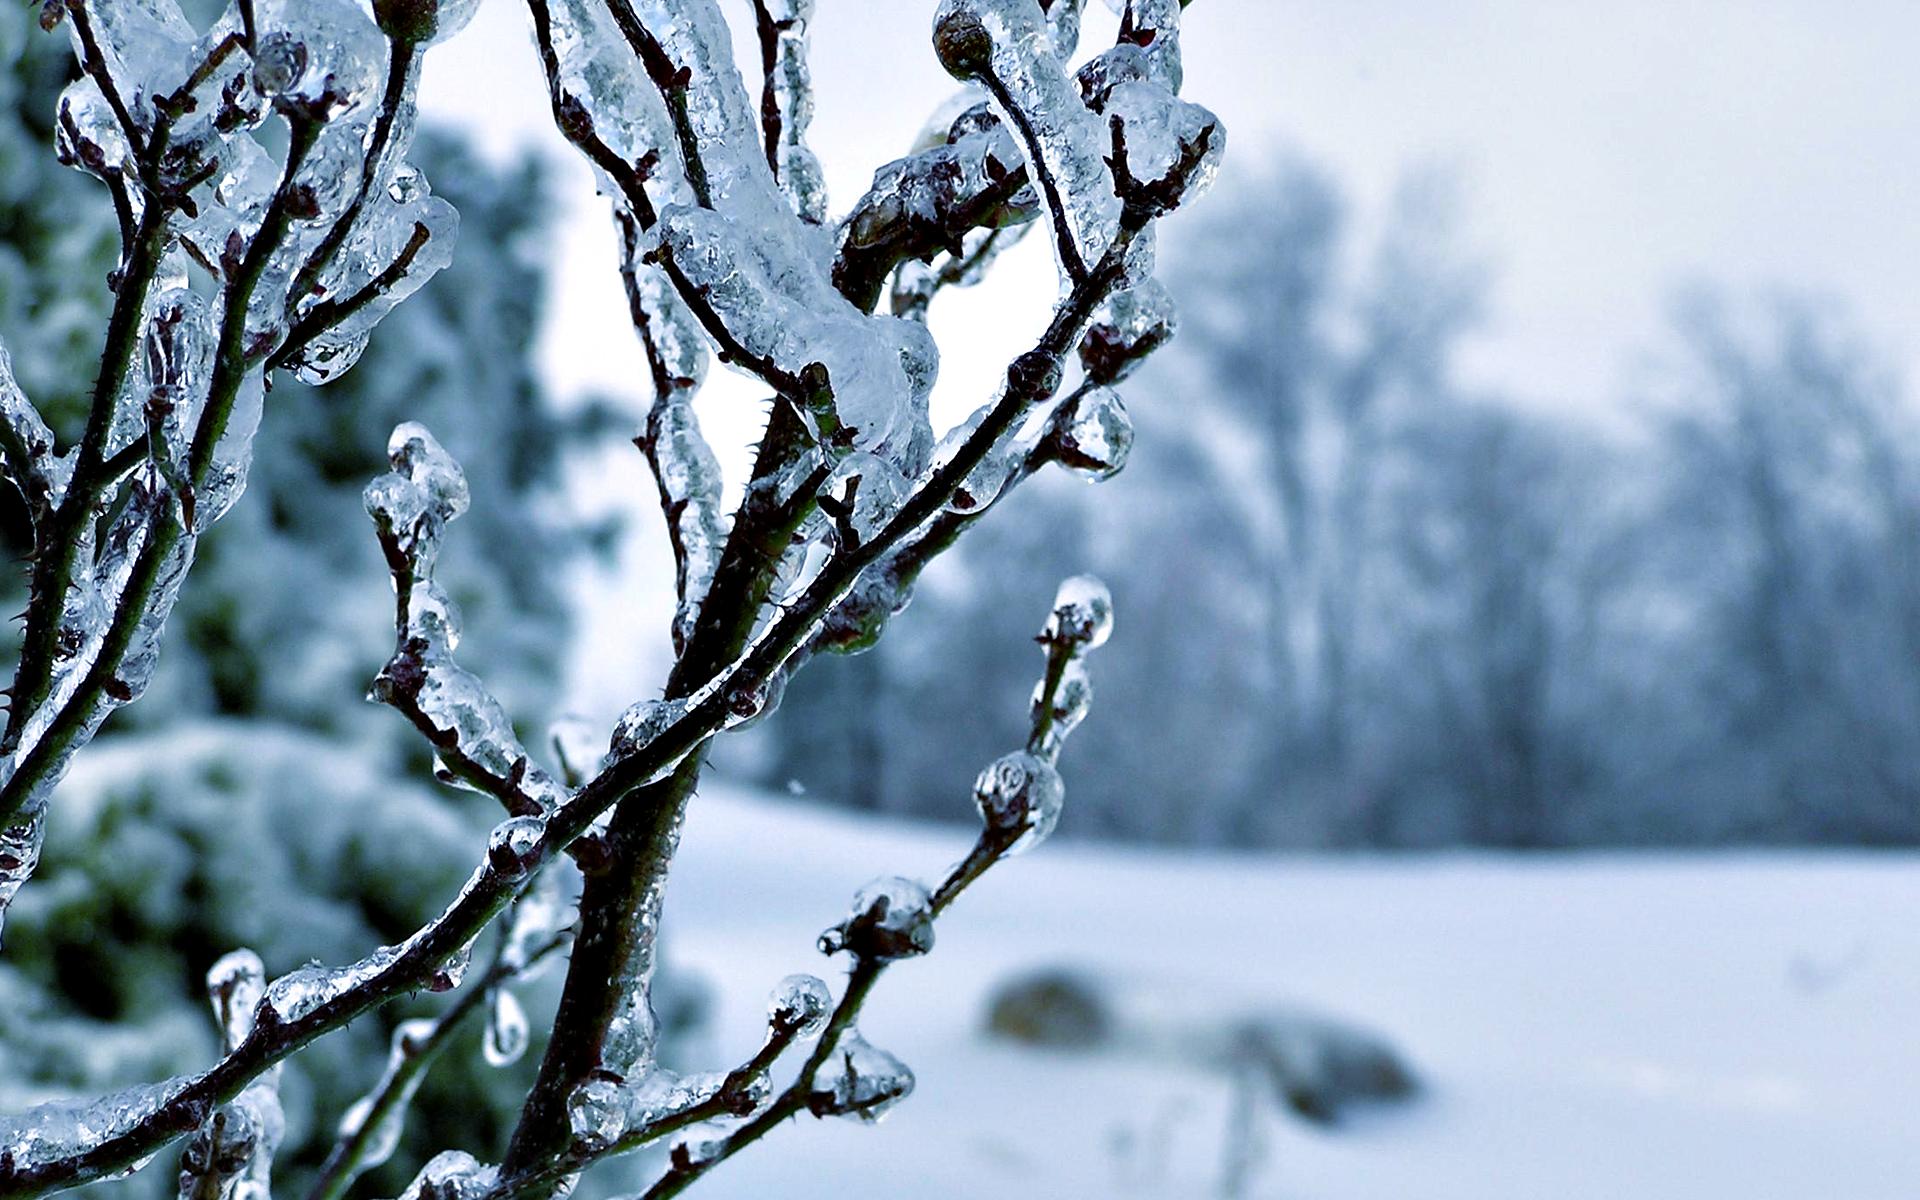 winter pics for wallpaper